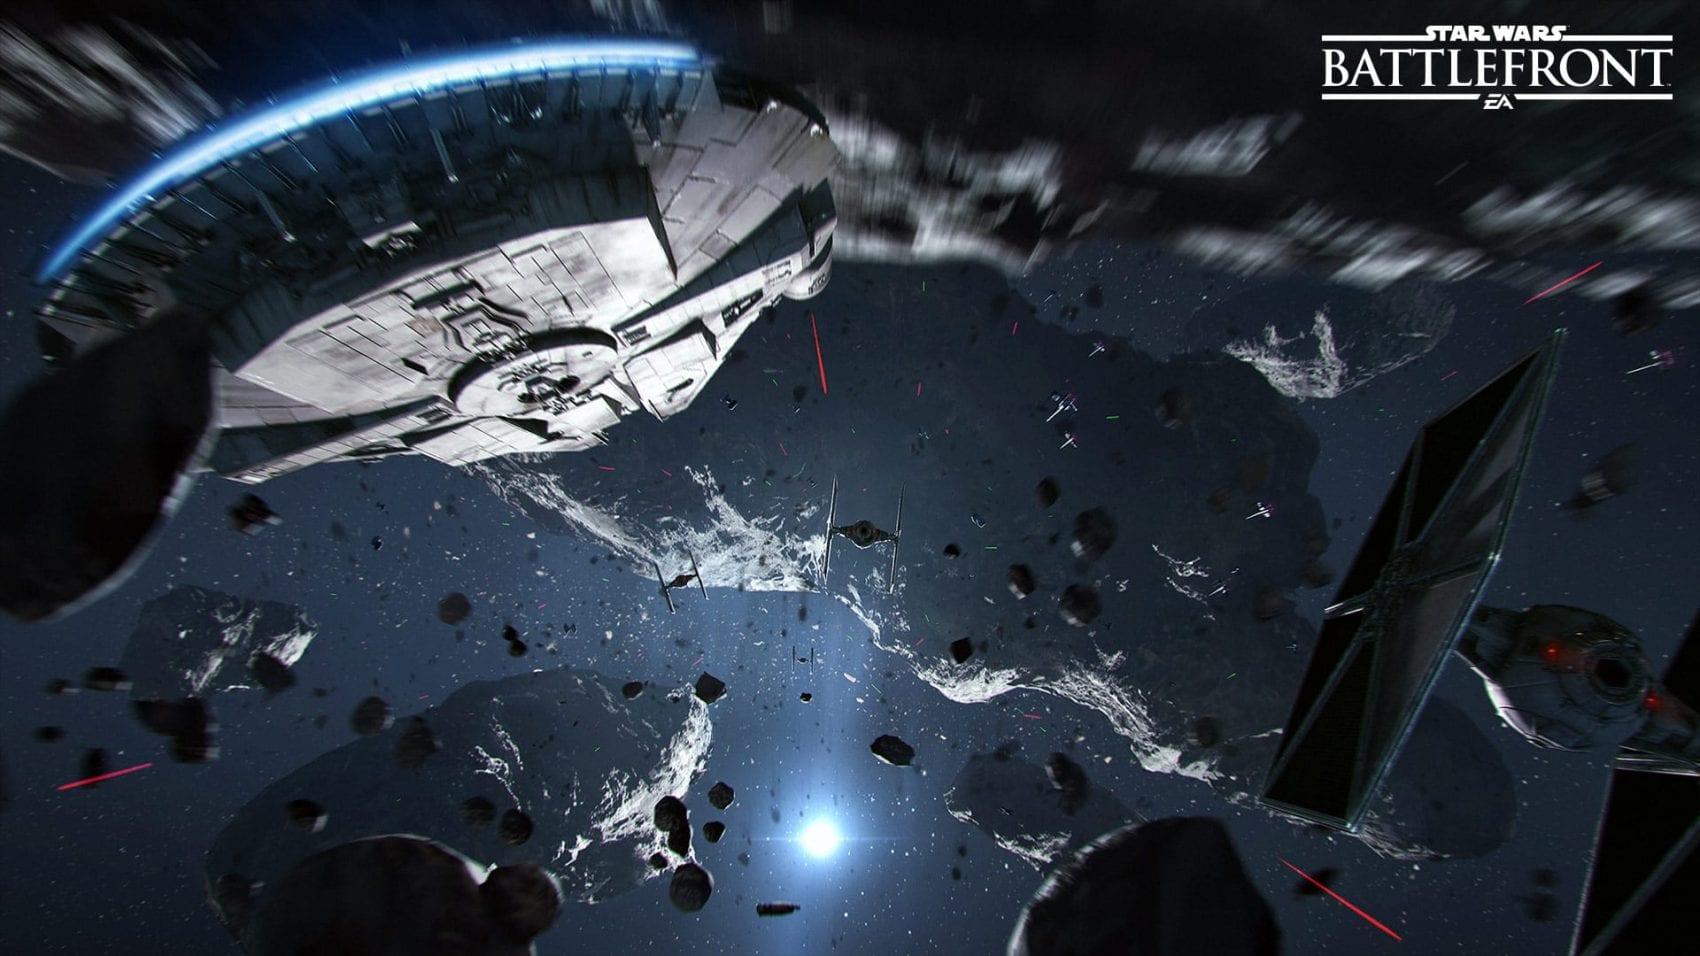 NEWS – Star Wars Battlefront